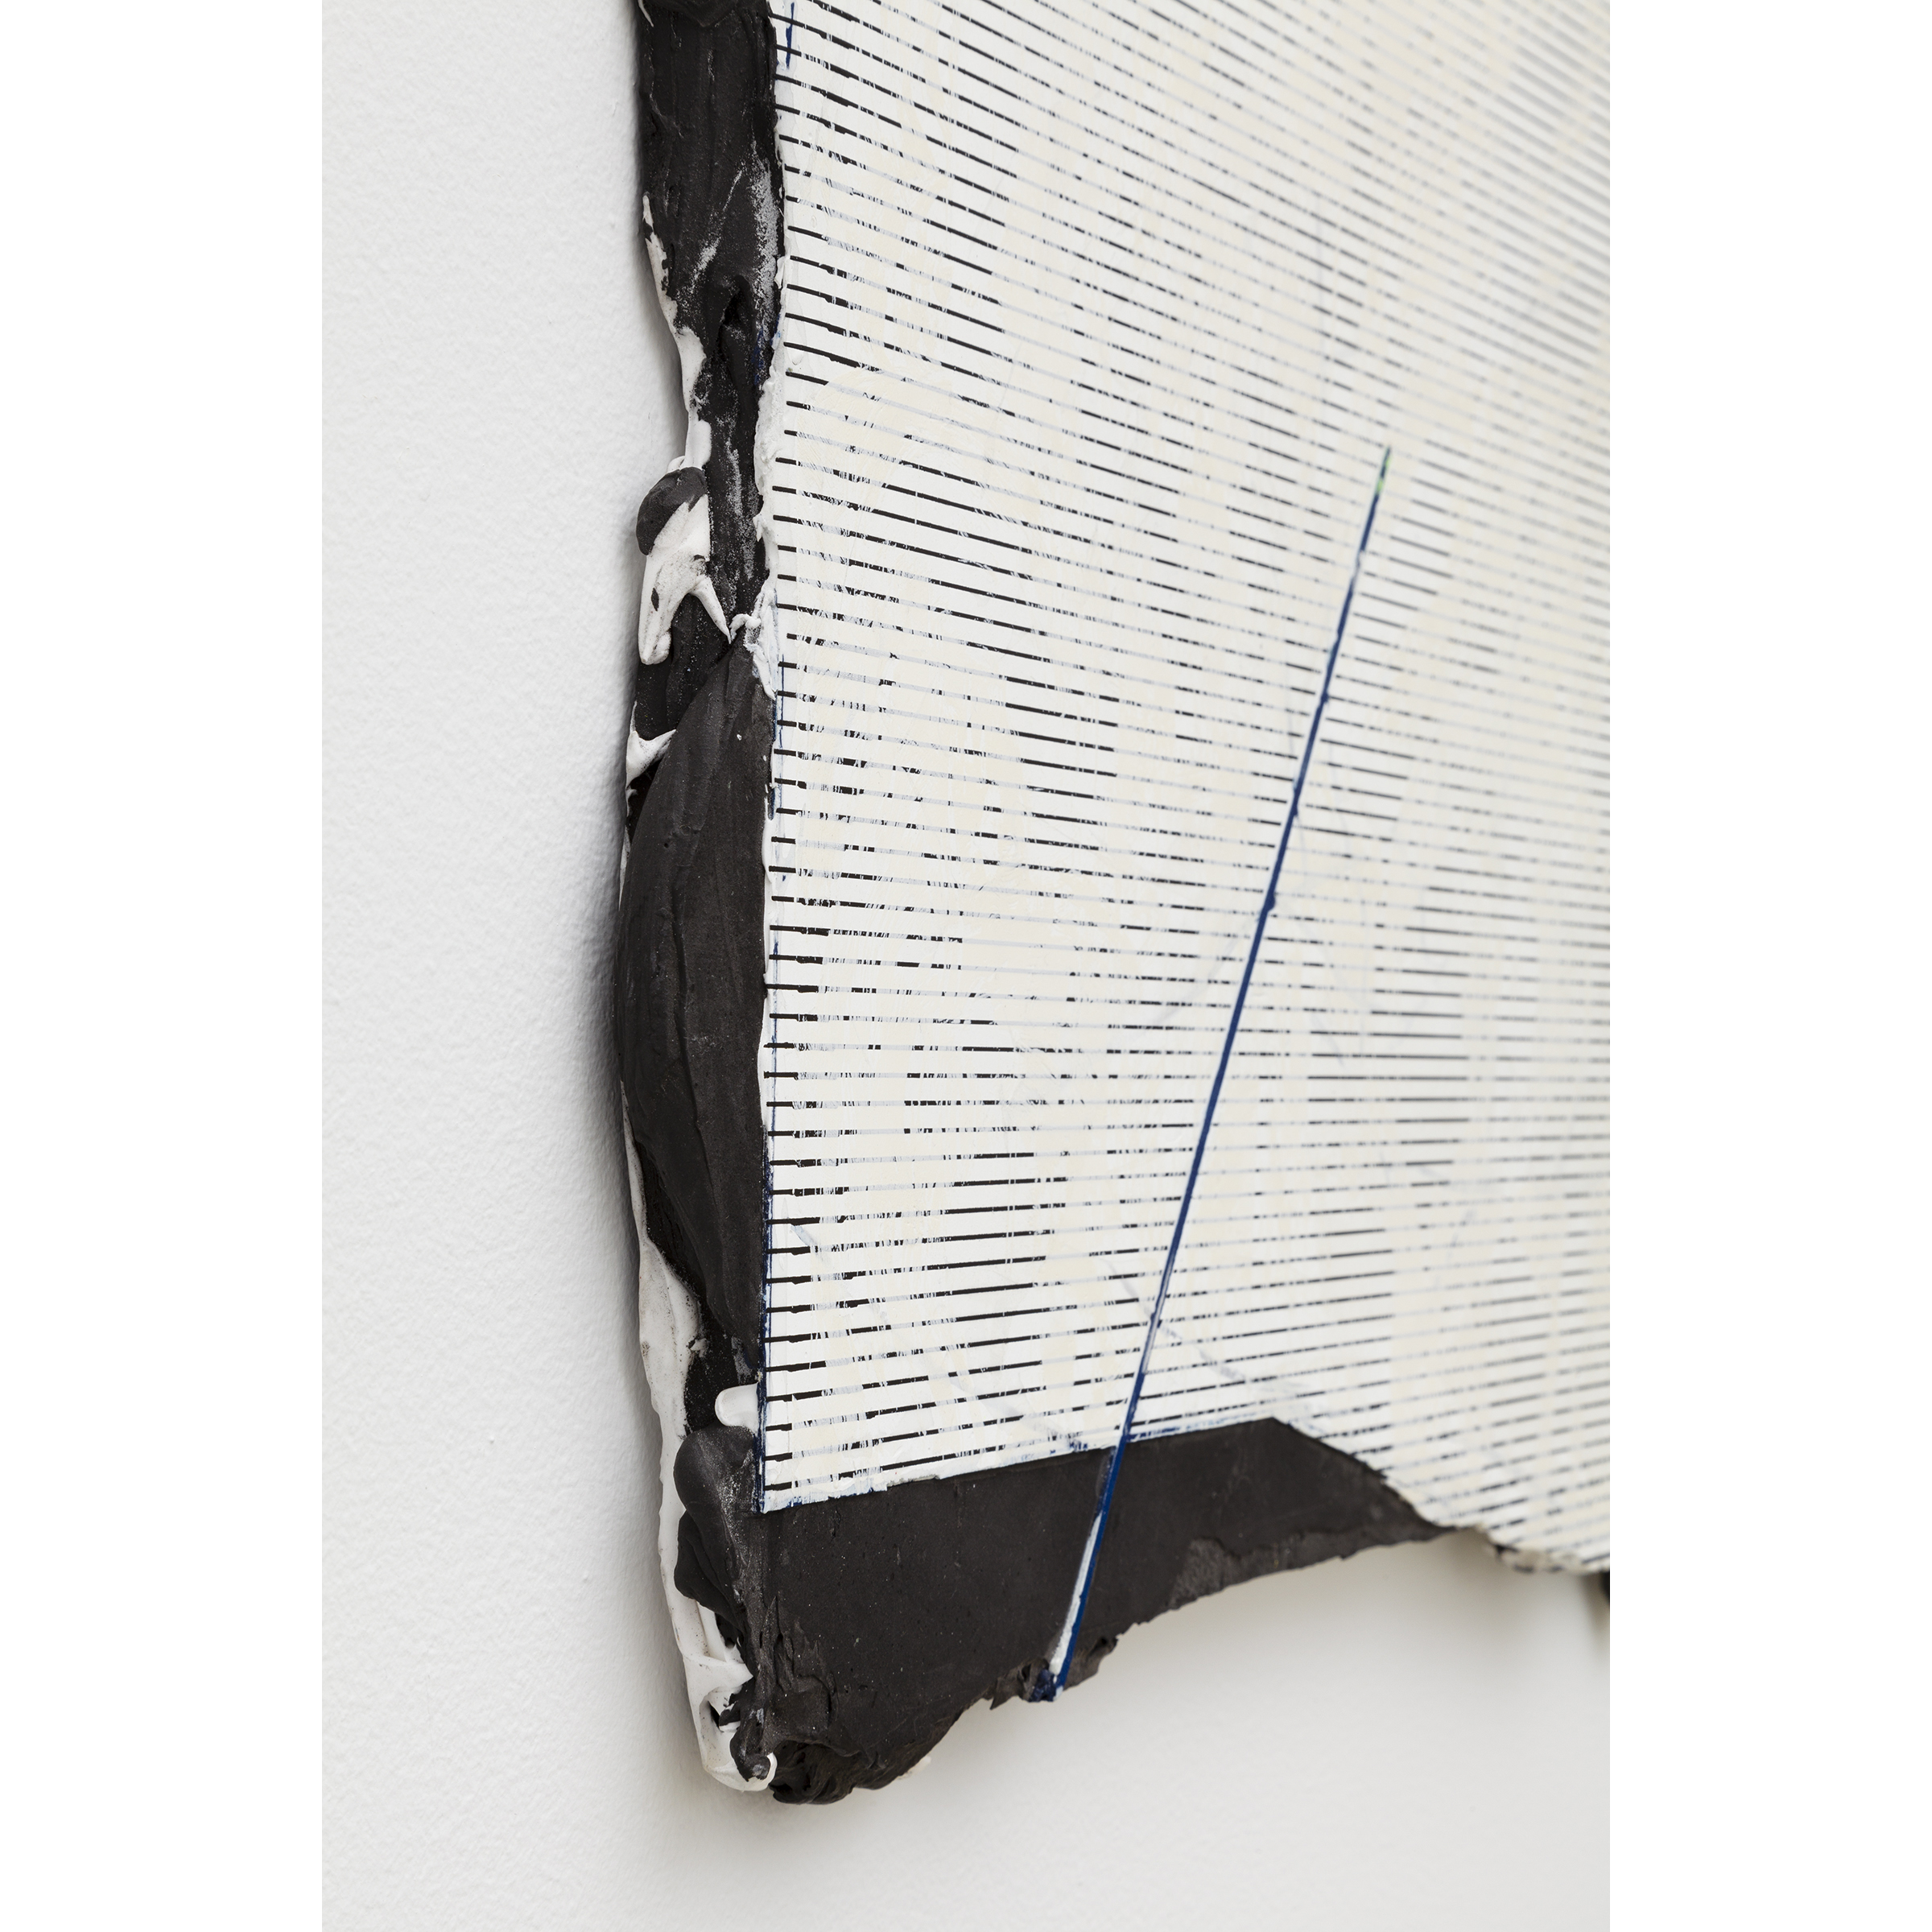 Nicolas Roggy, Untitled  (detail), 2014,primer, modeling paste, pigment, acrylic paint, silkscreen print on PVC,29.9 x 30.3 x 0.5 in